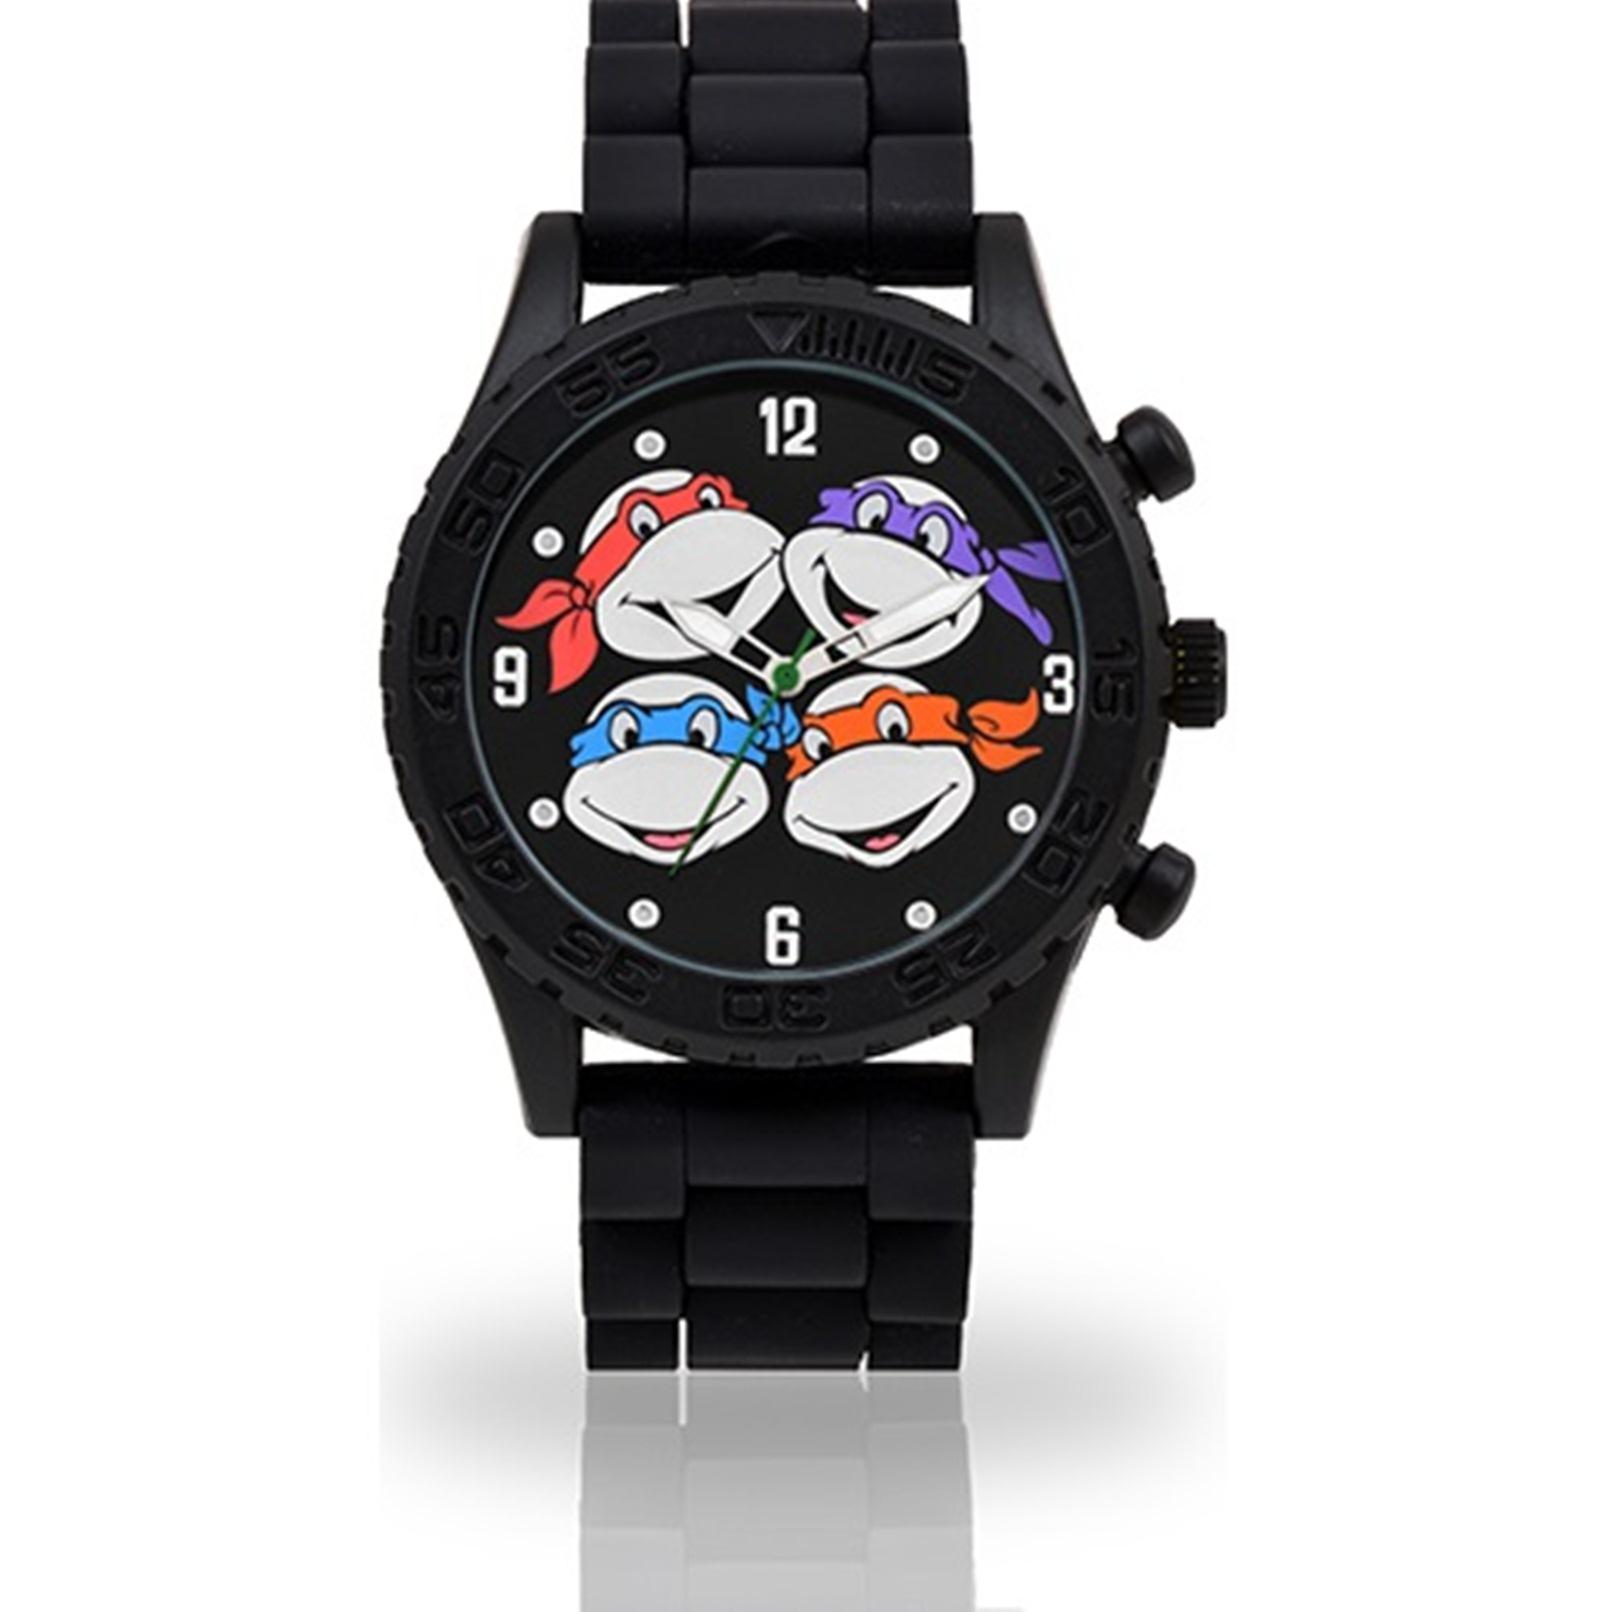 accutime ninja turtle watch instructions